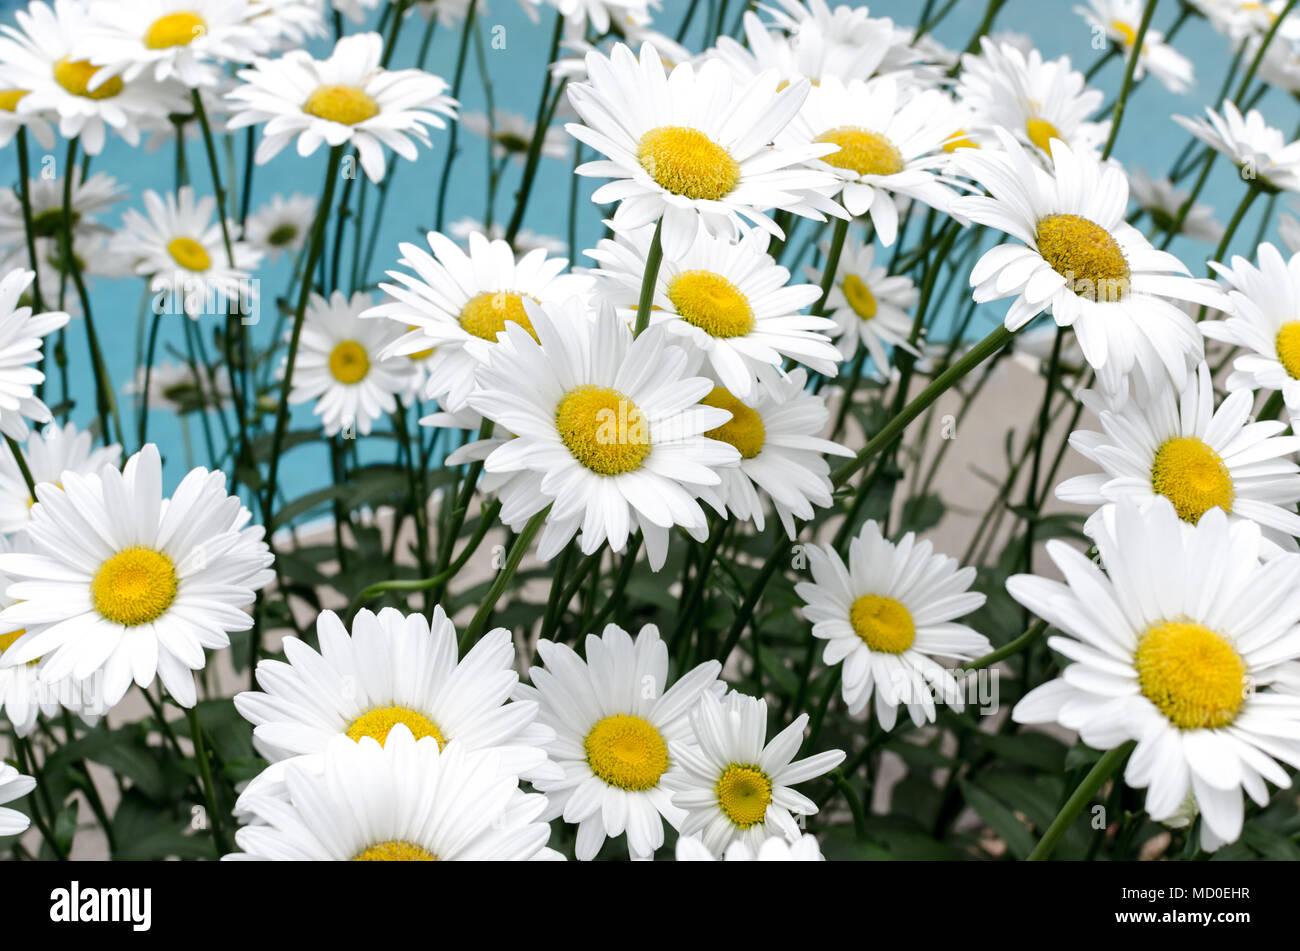 Botany Daisies Daisy Flower Green Leaves Nature White Yellow Stock